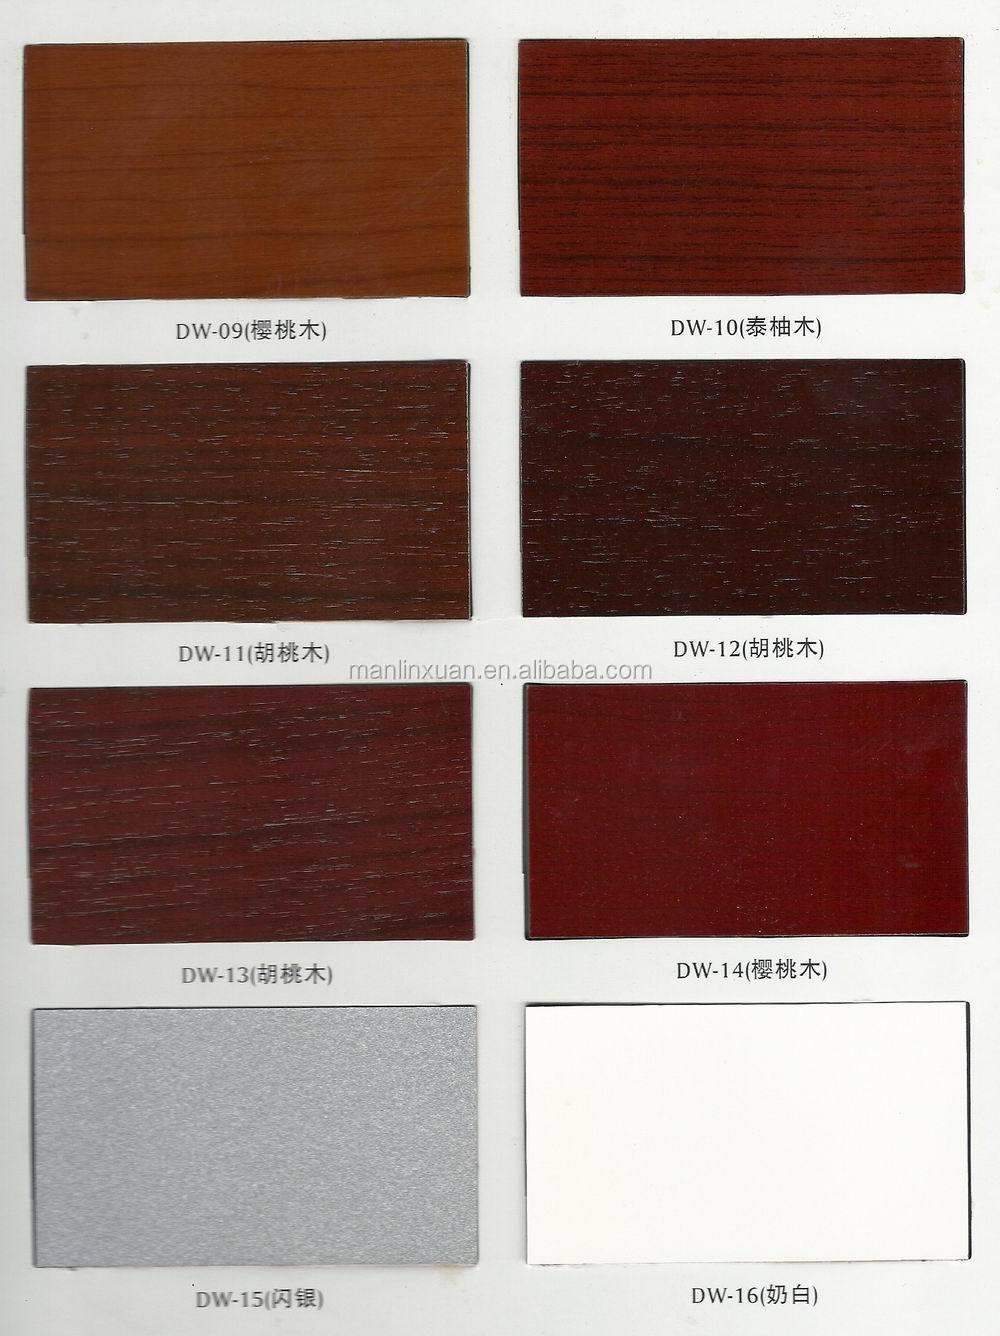 Paars fluweel dot patroon a10058 bankstel woonkamer sofa product ...